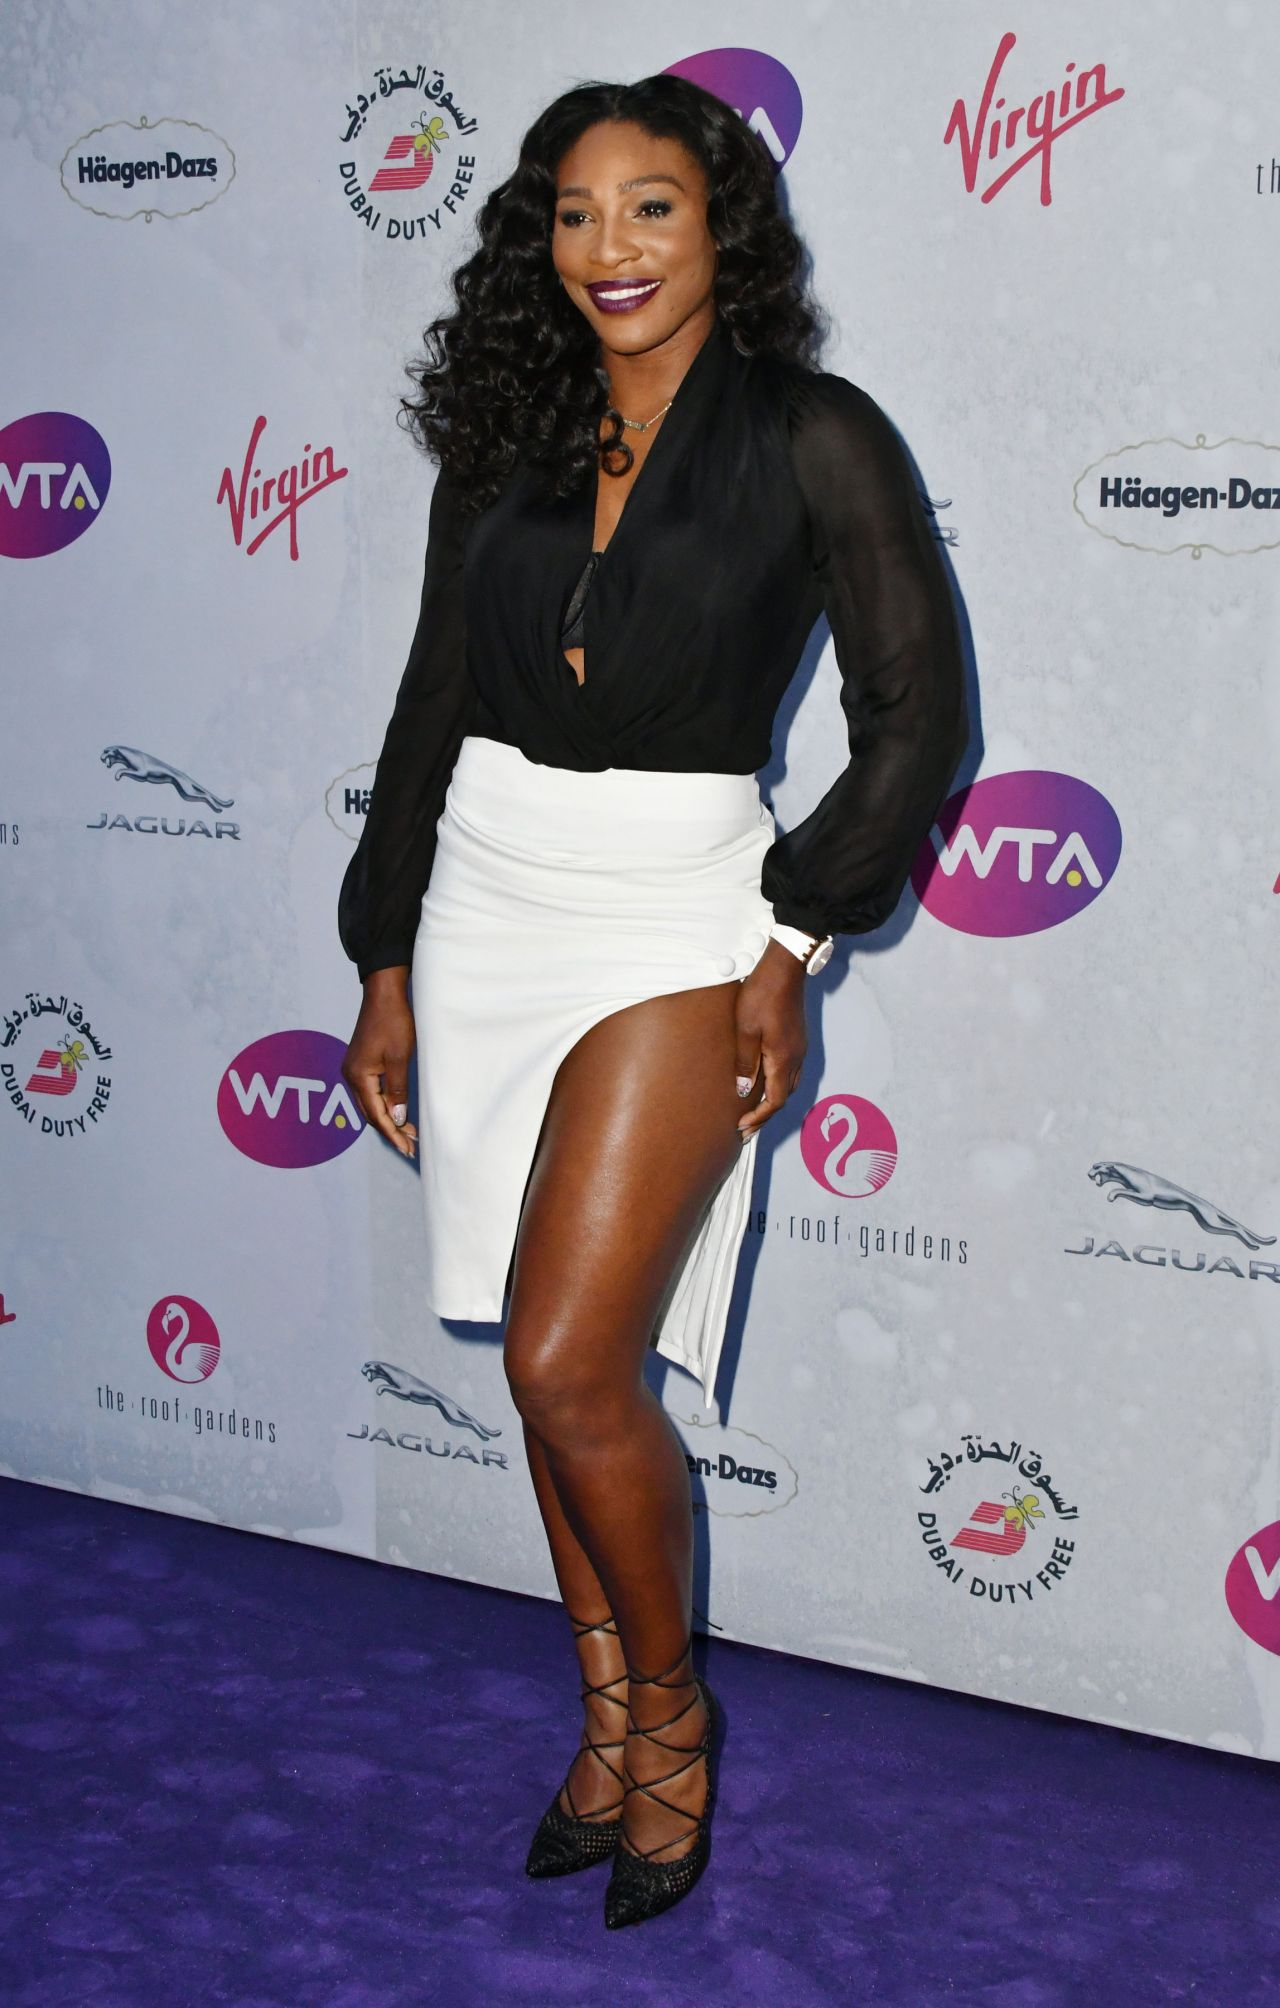 Serena Williams Wta Pre Wimbledon Party In London June 2016